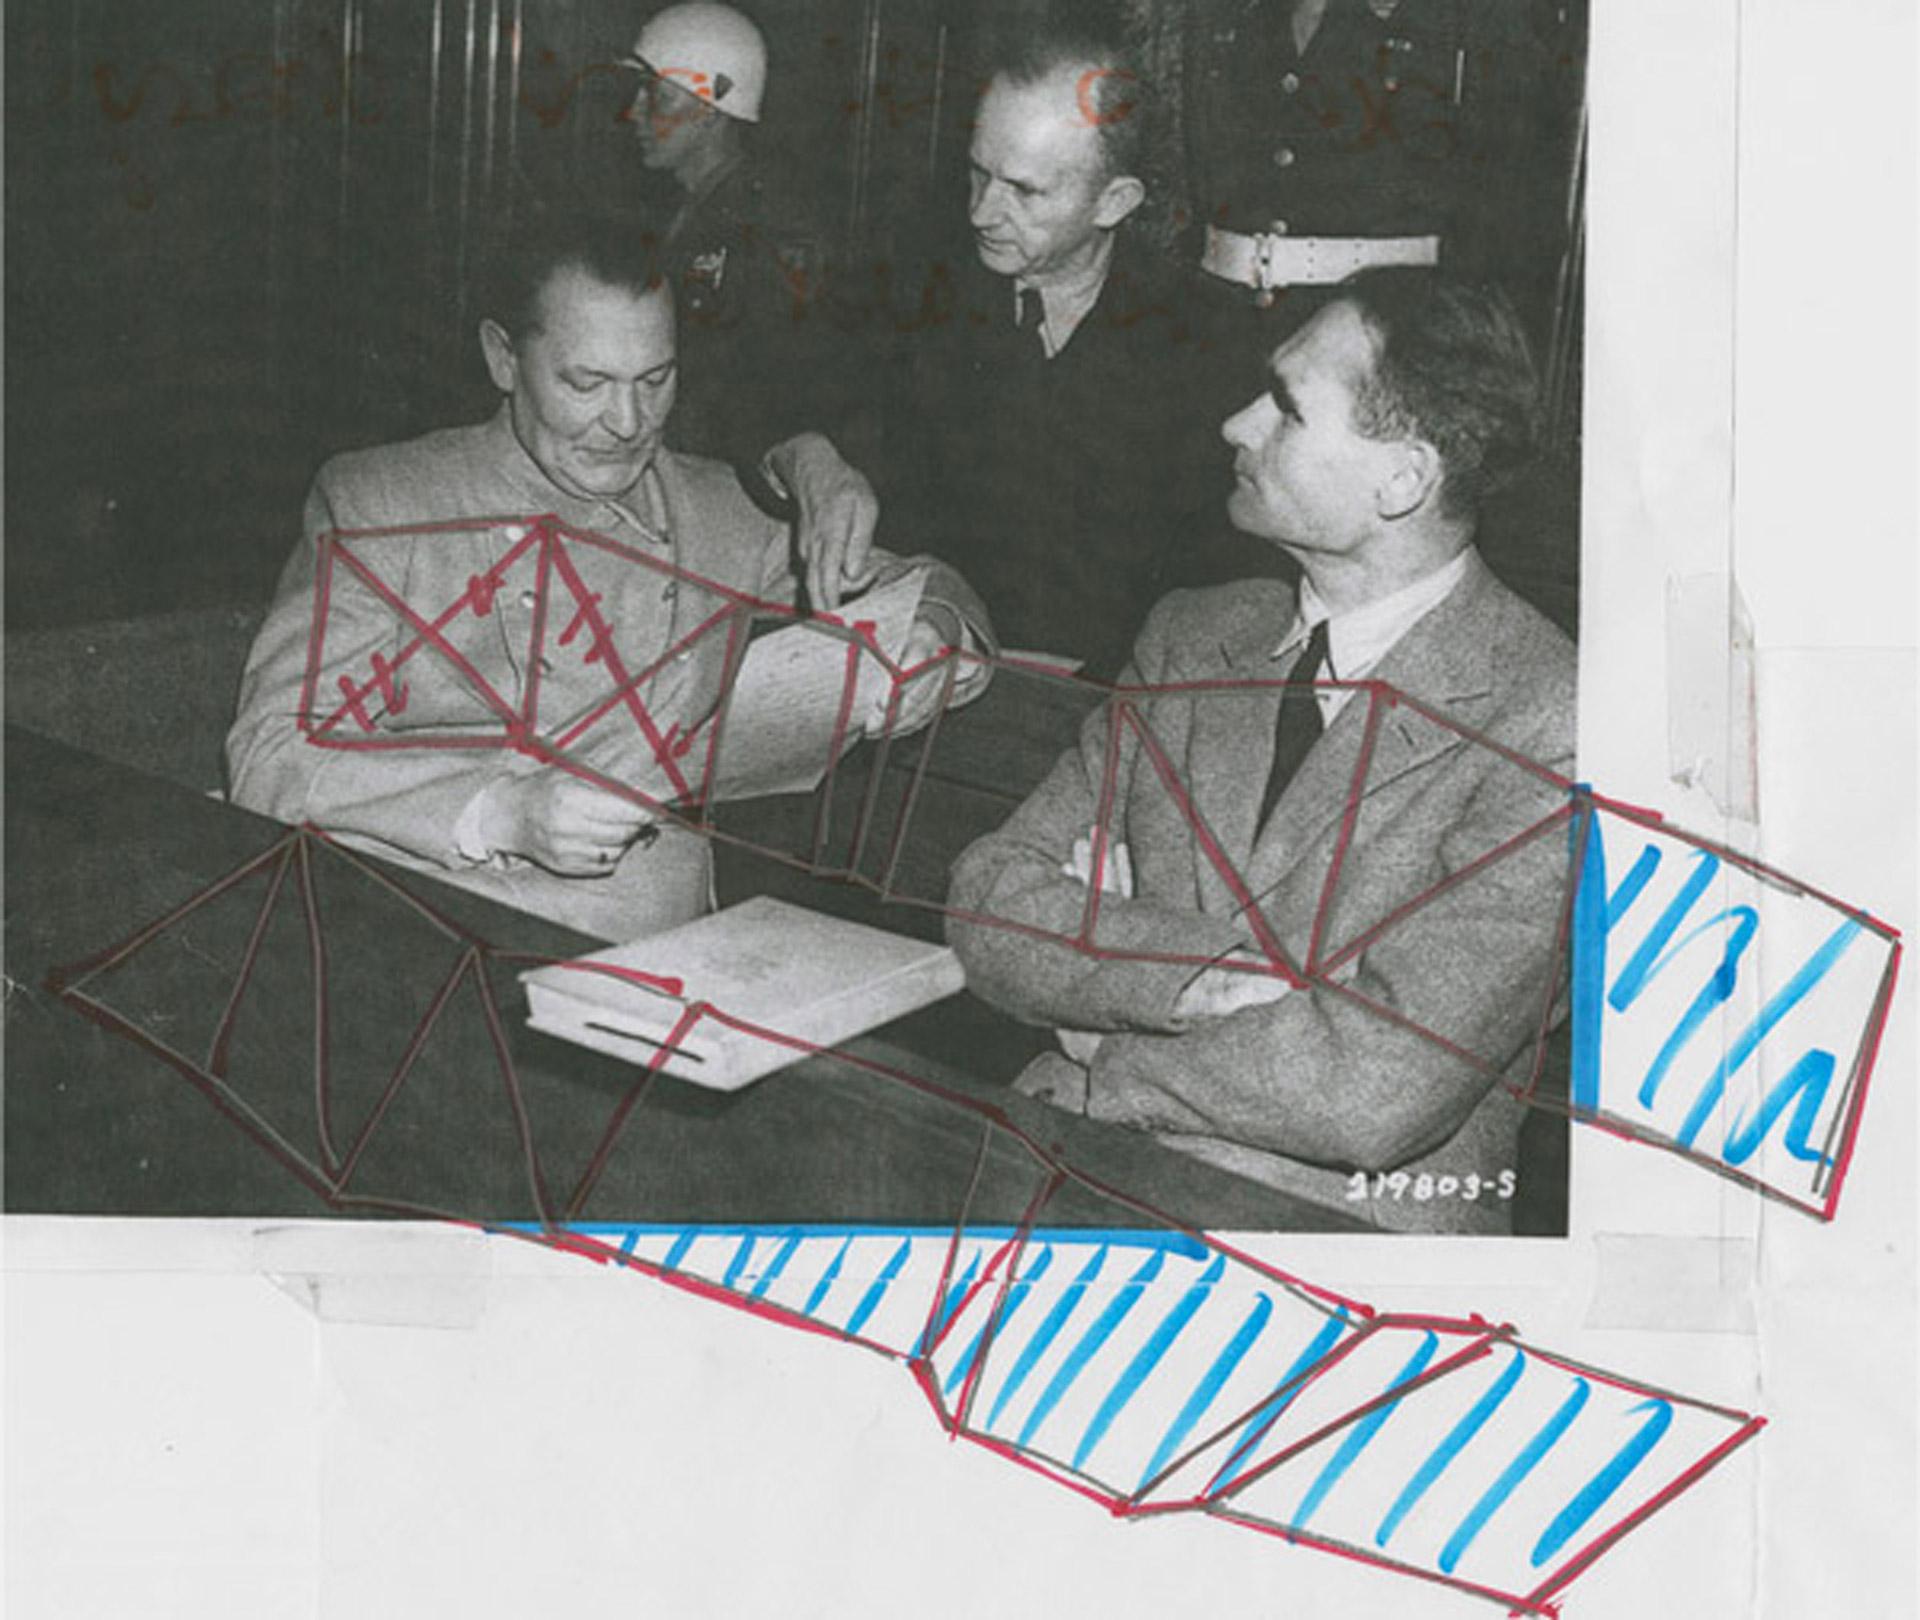 Tino Seubert - Forming History - Nuremberg Trials Bench - Sketch